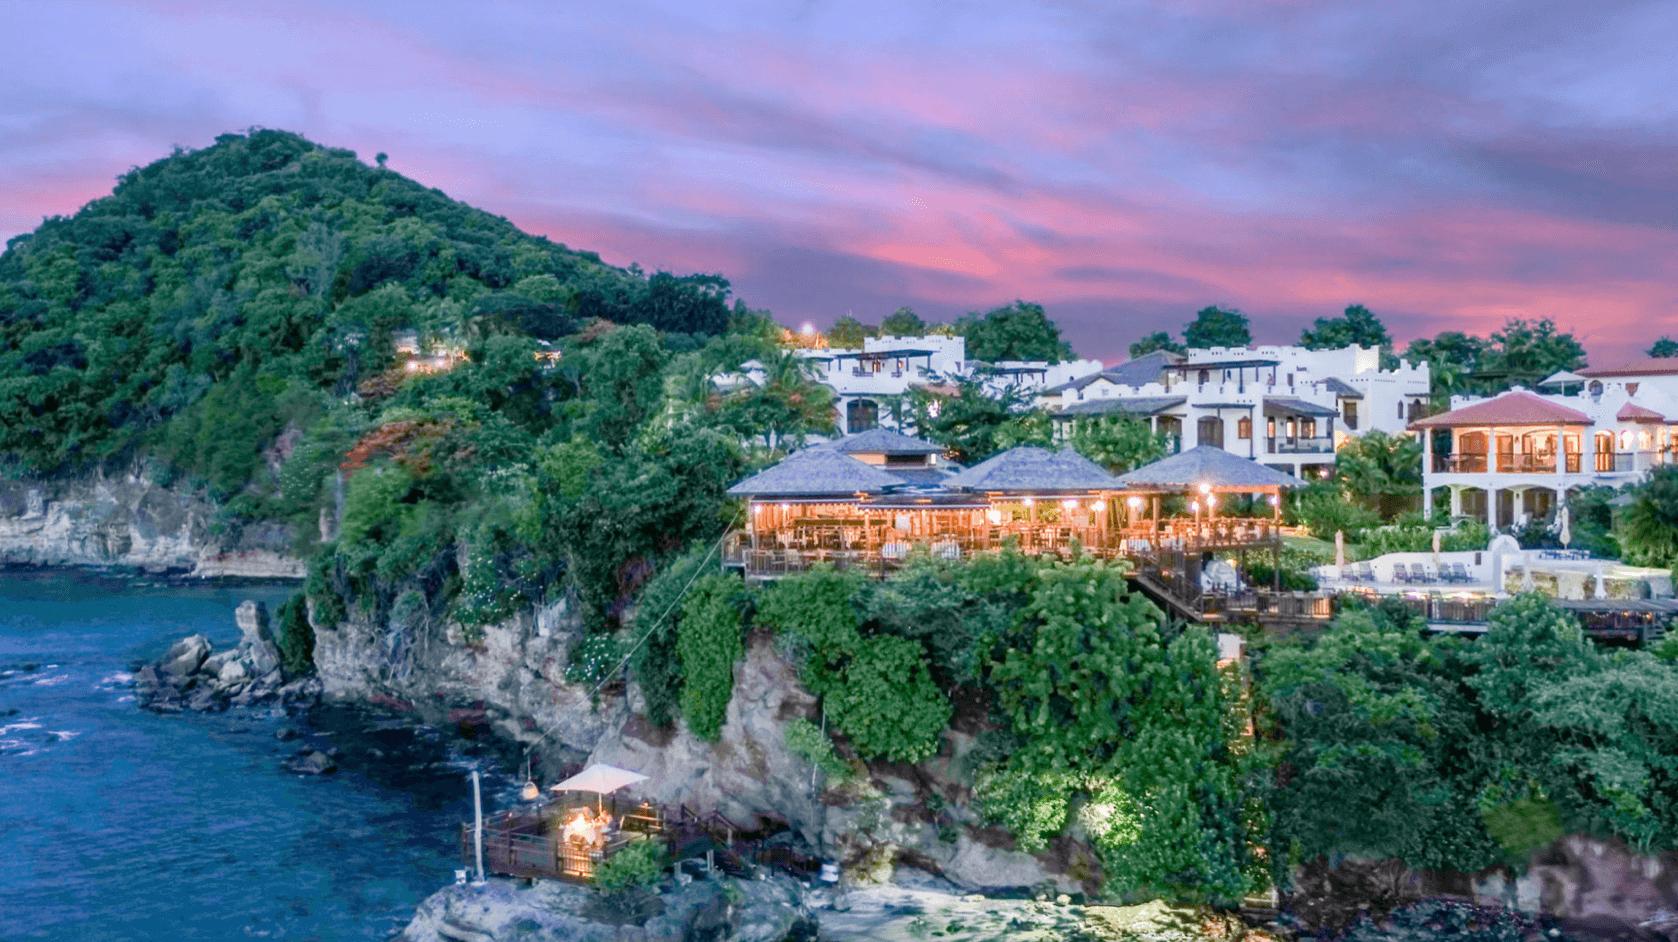 St Lucia'daki Cap Maison fotoğraf